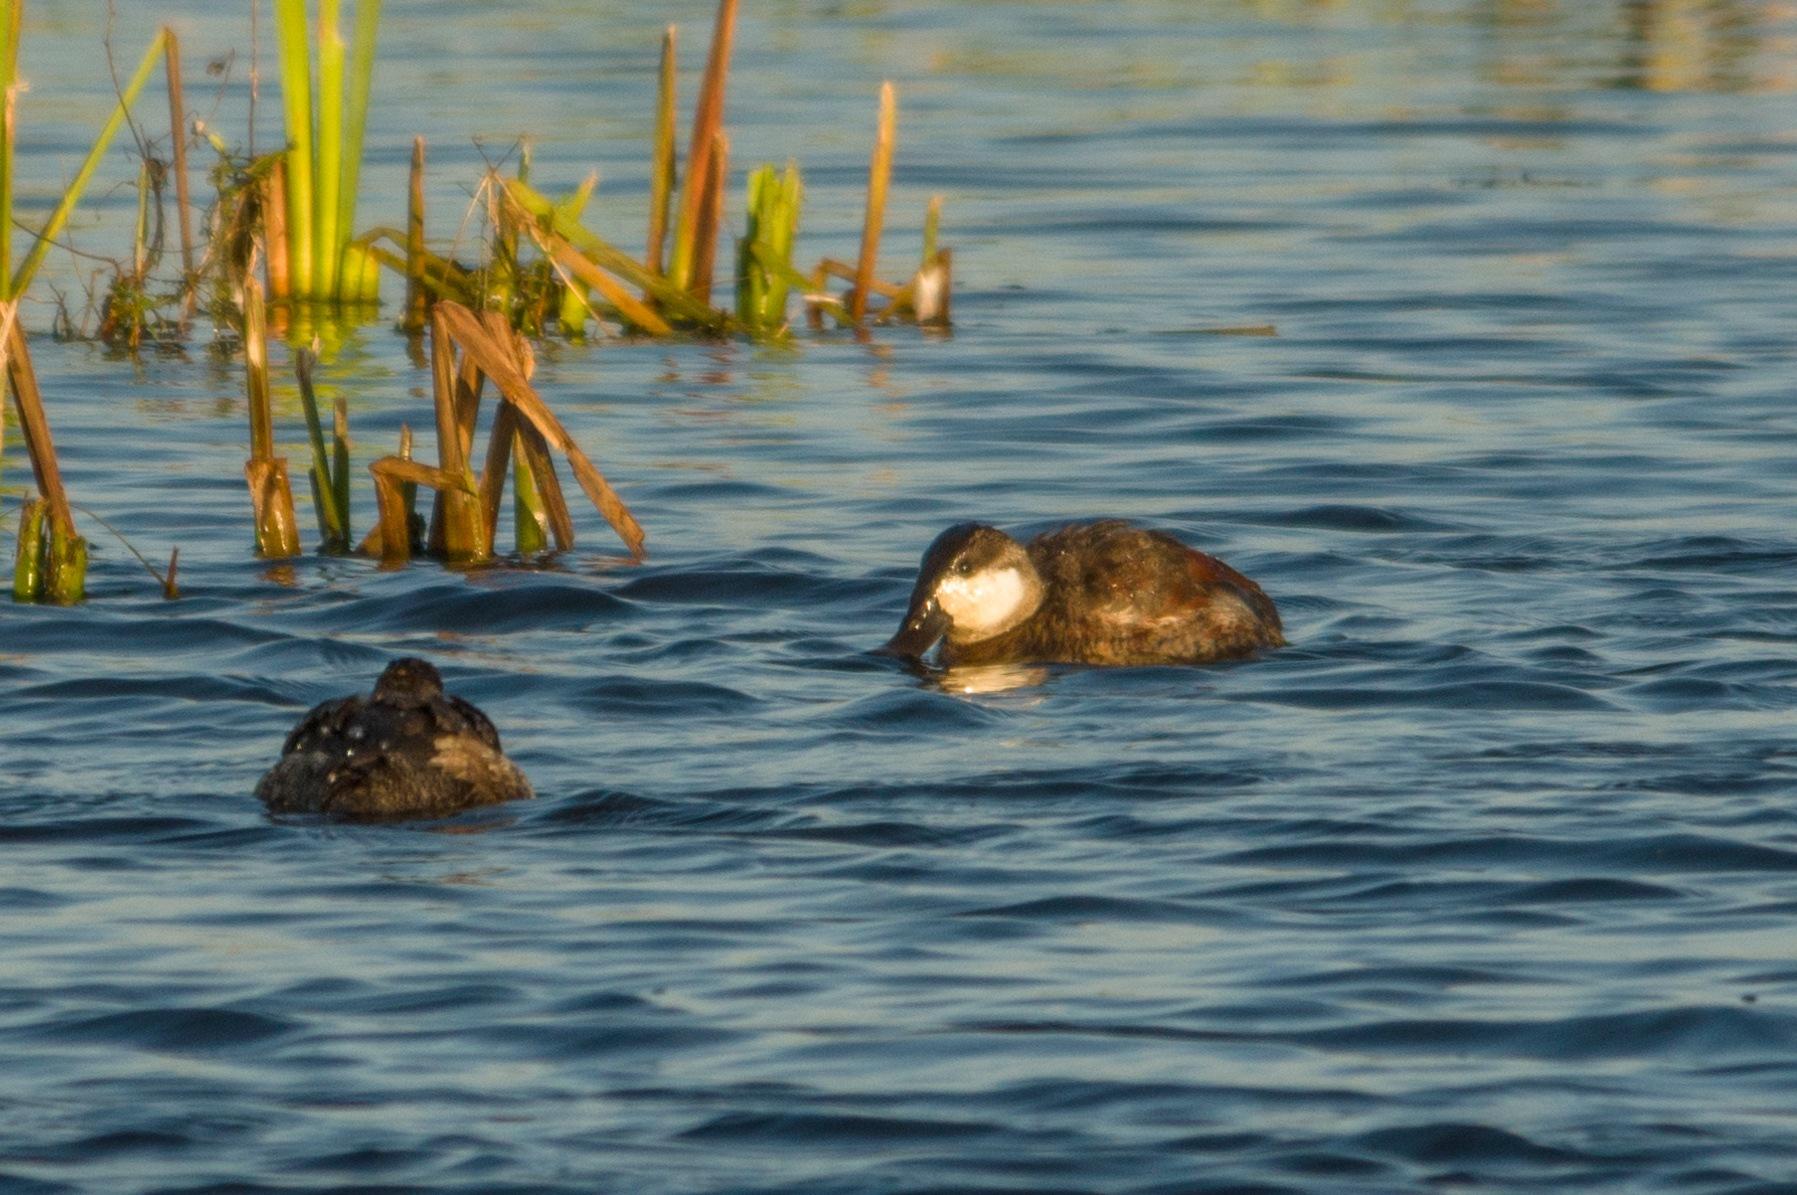 Ruddy Duck by boriscleto